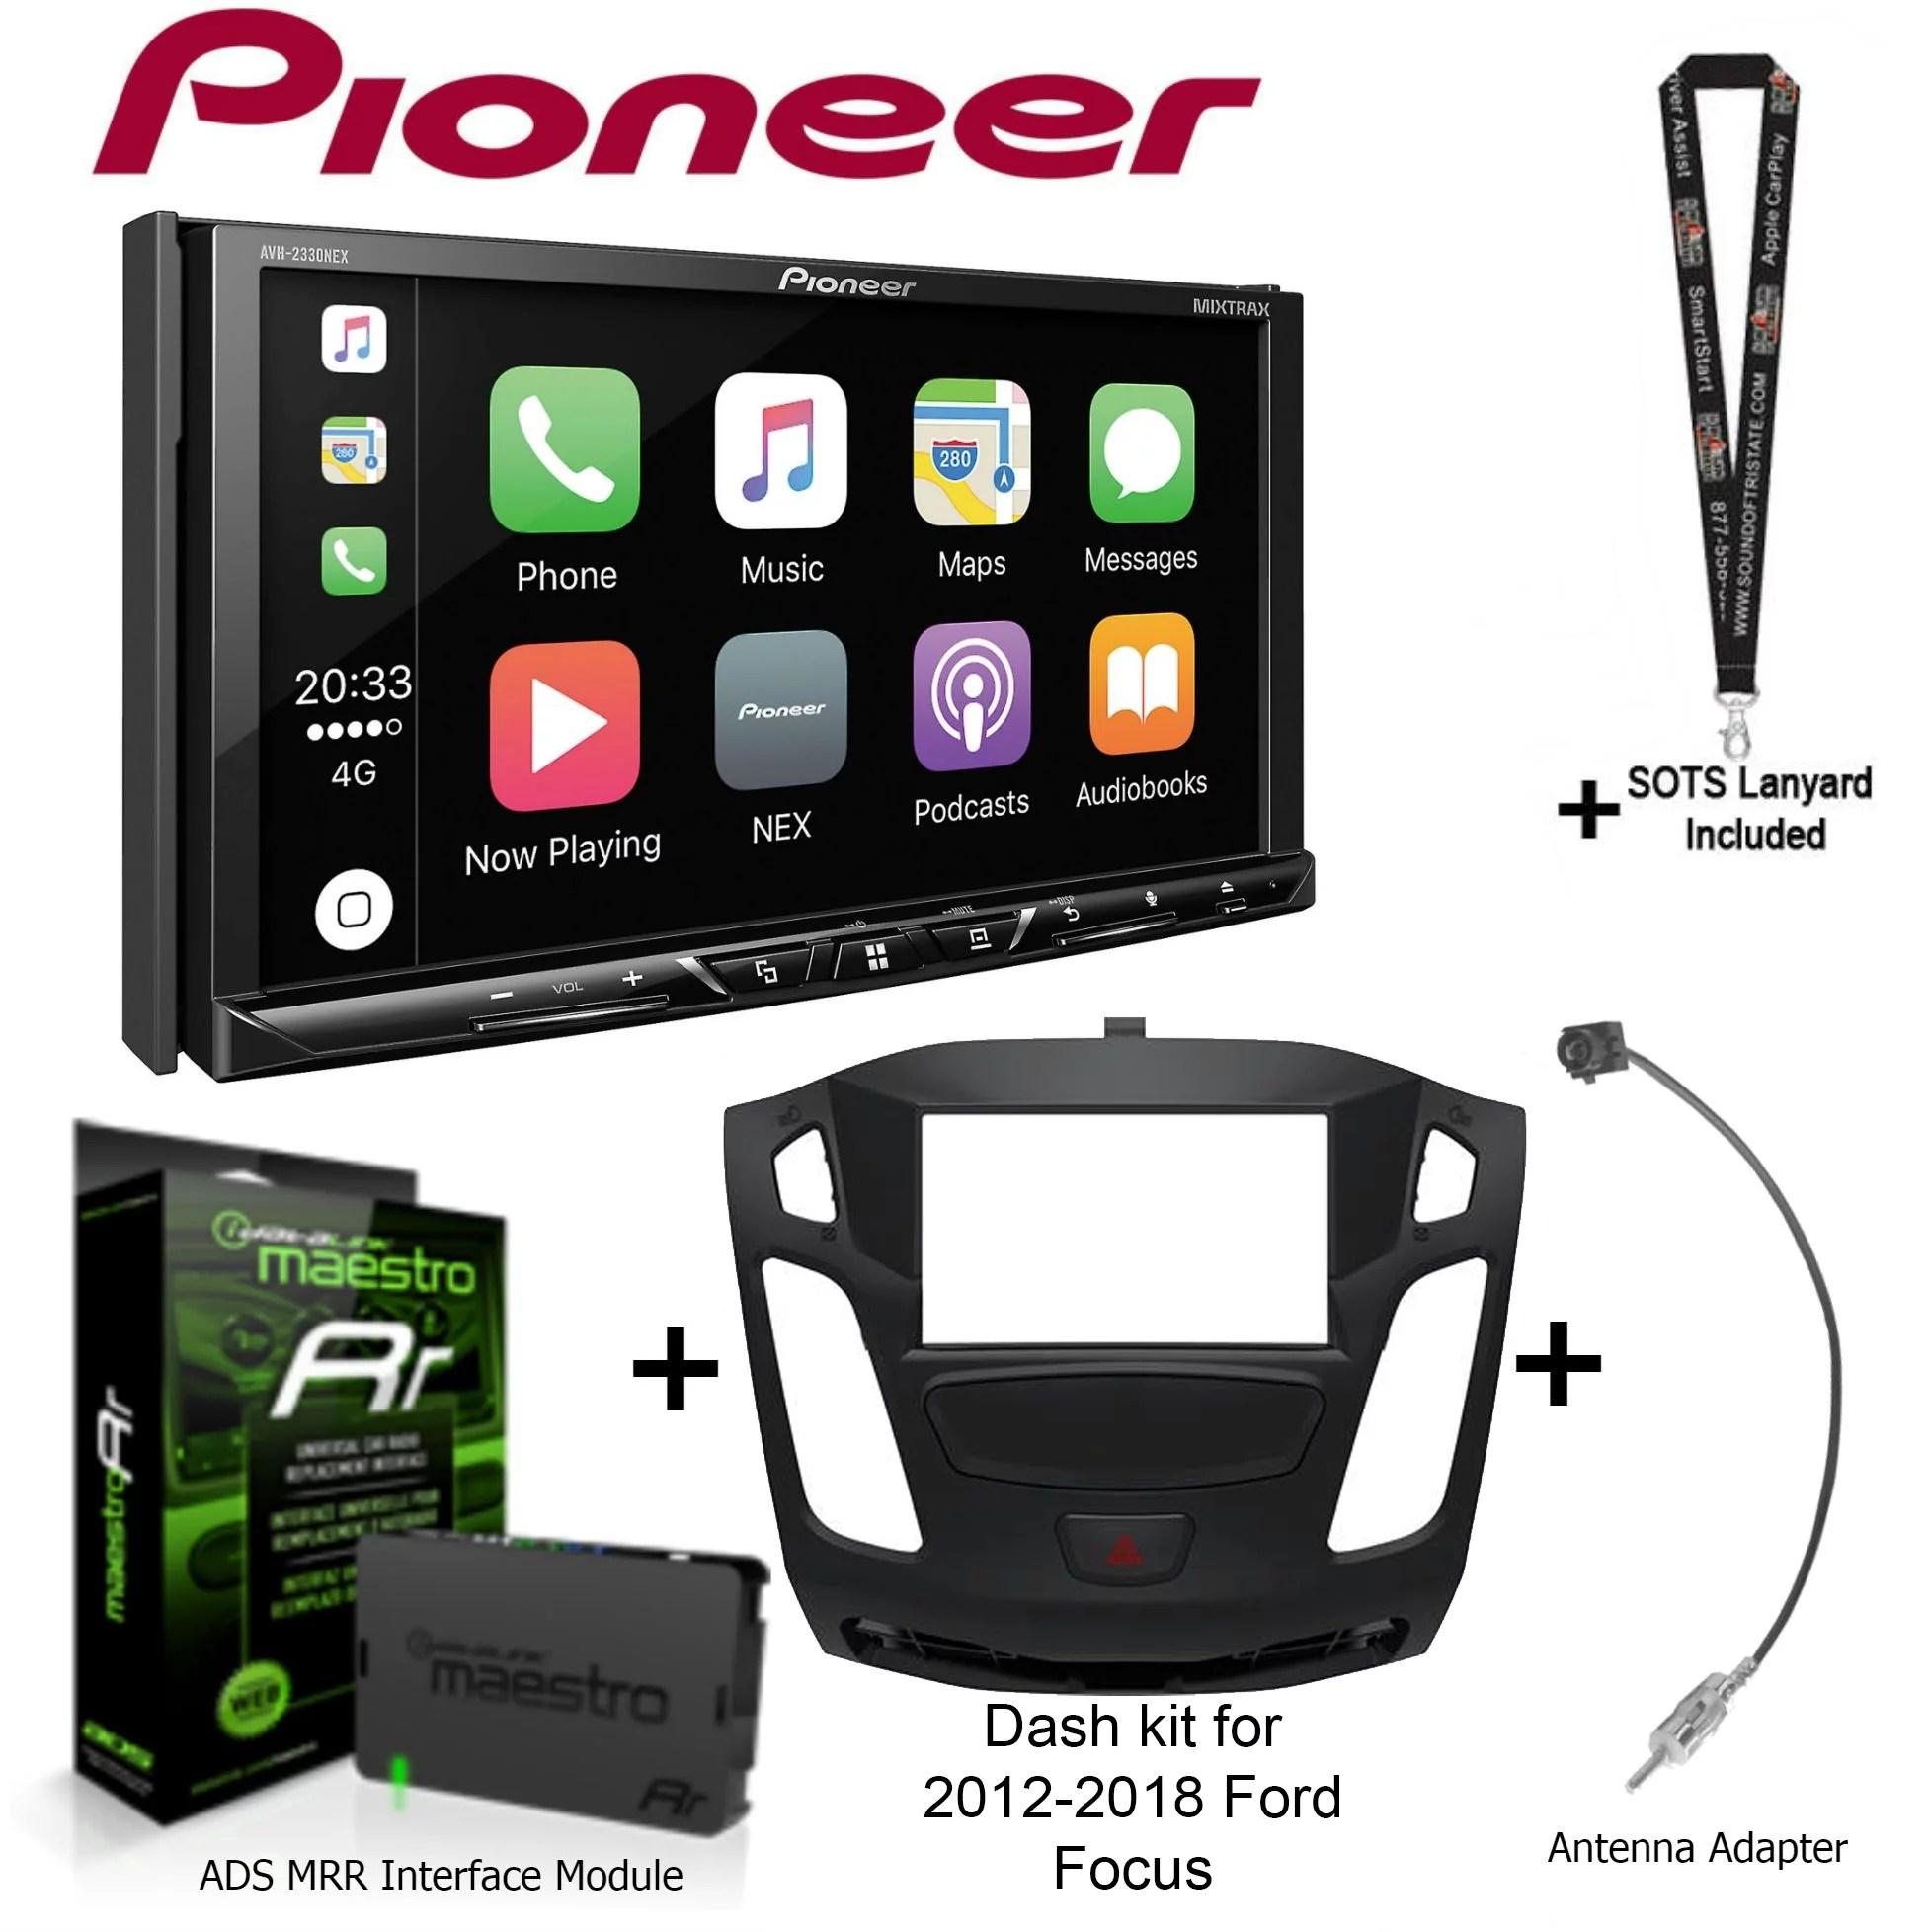 hight resolution of pioneer avh 2330nex 7 dvd receiver idatalink maestro kit foc1 dash kit